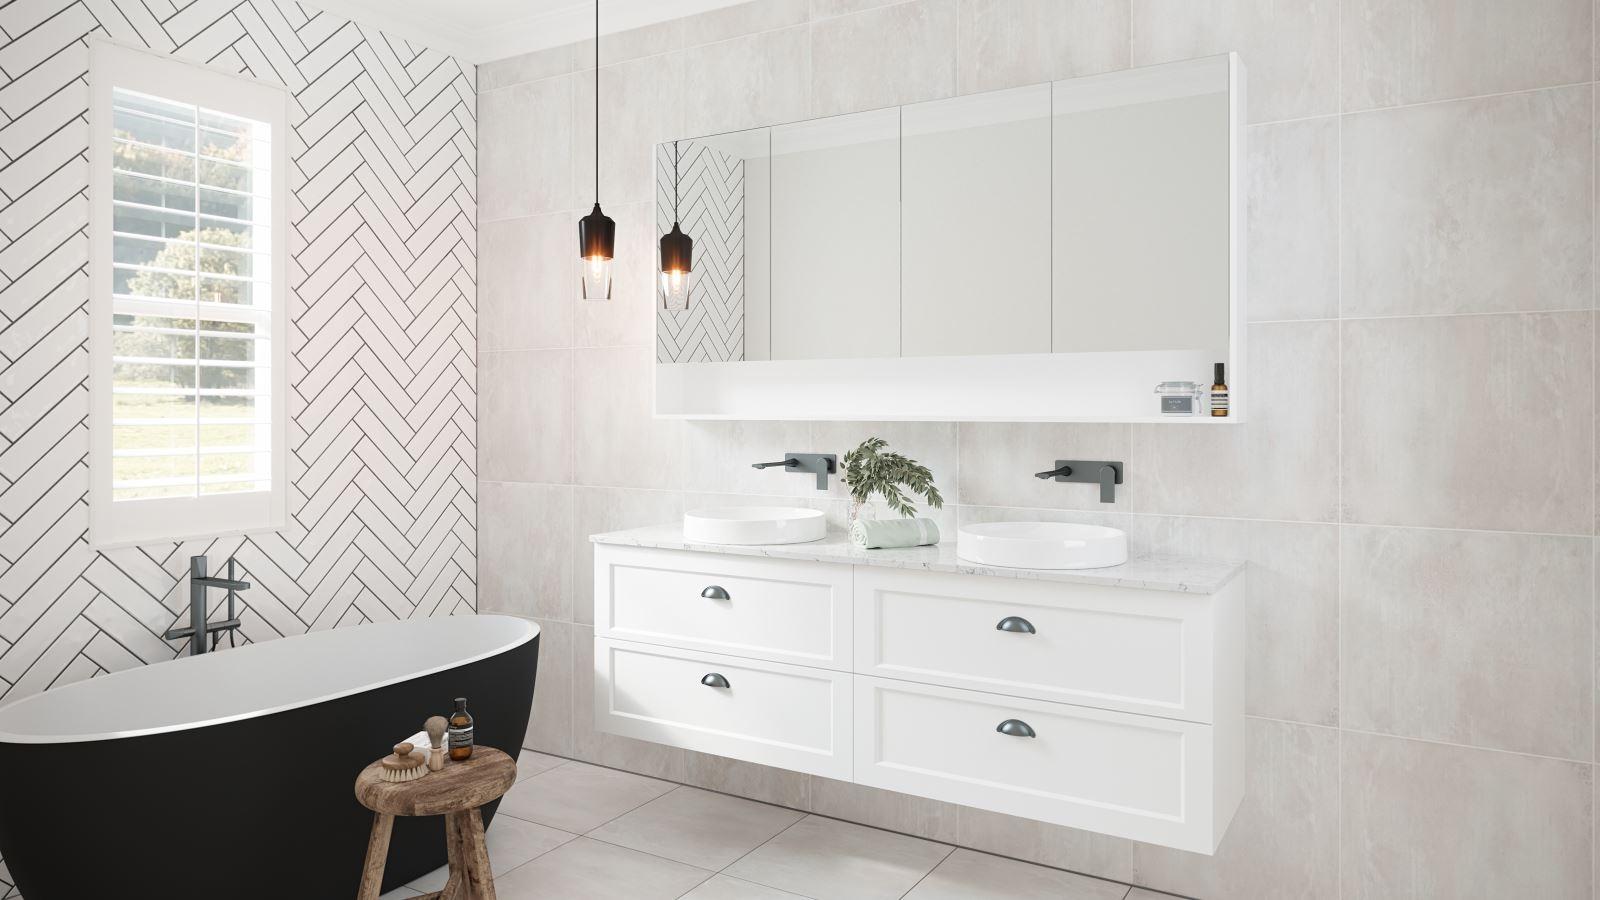 Timeberline Washington 1800mm, Shaker Style Vanity Bathroom